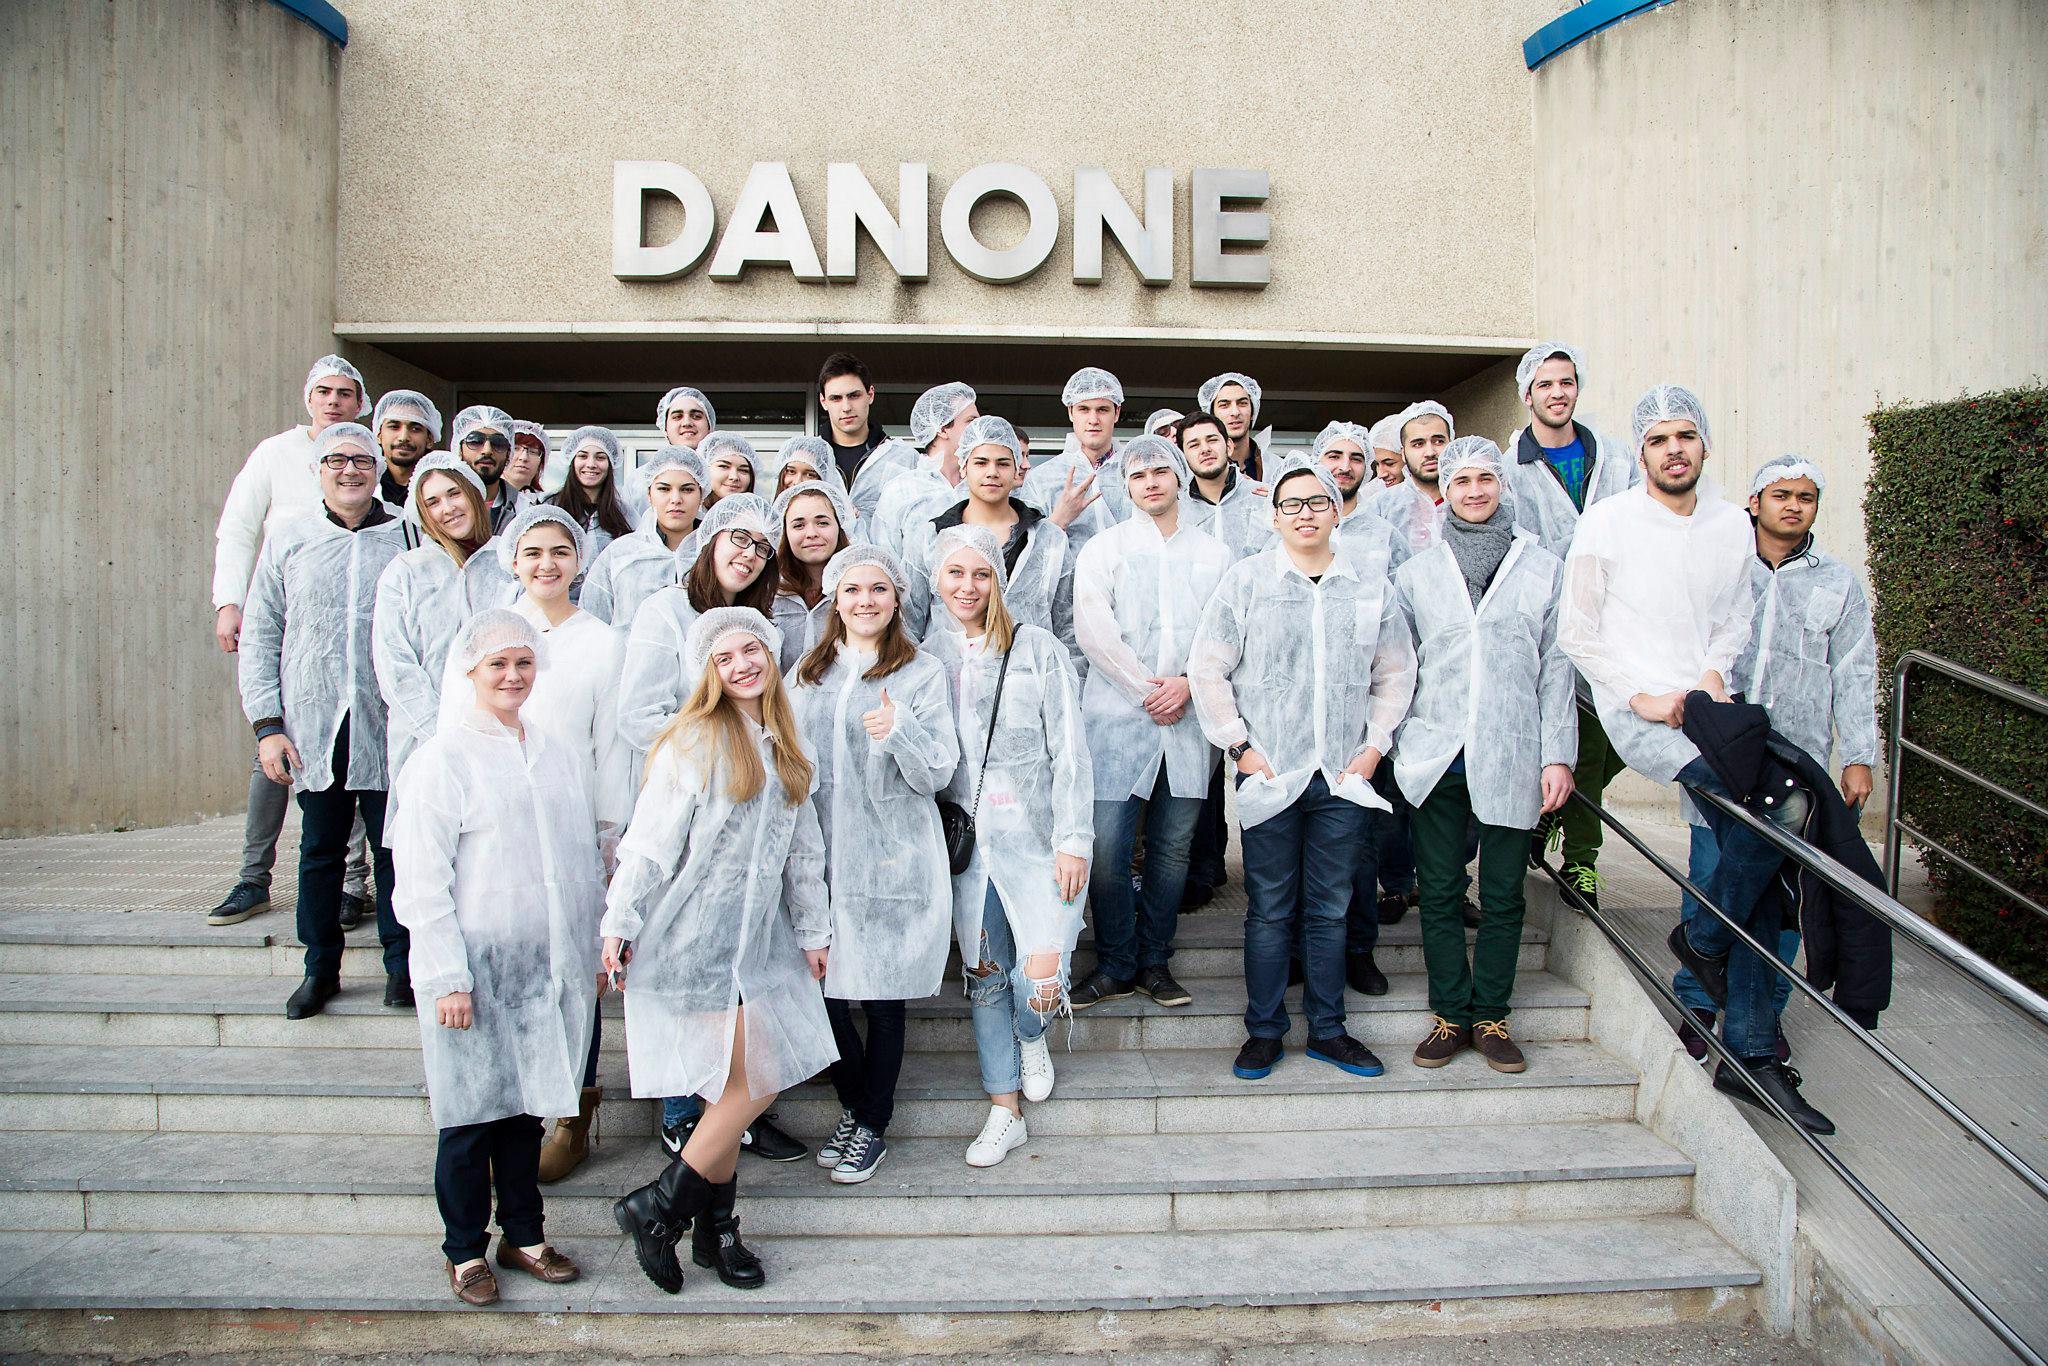 Industrial Visit: Danone Factory